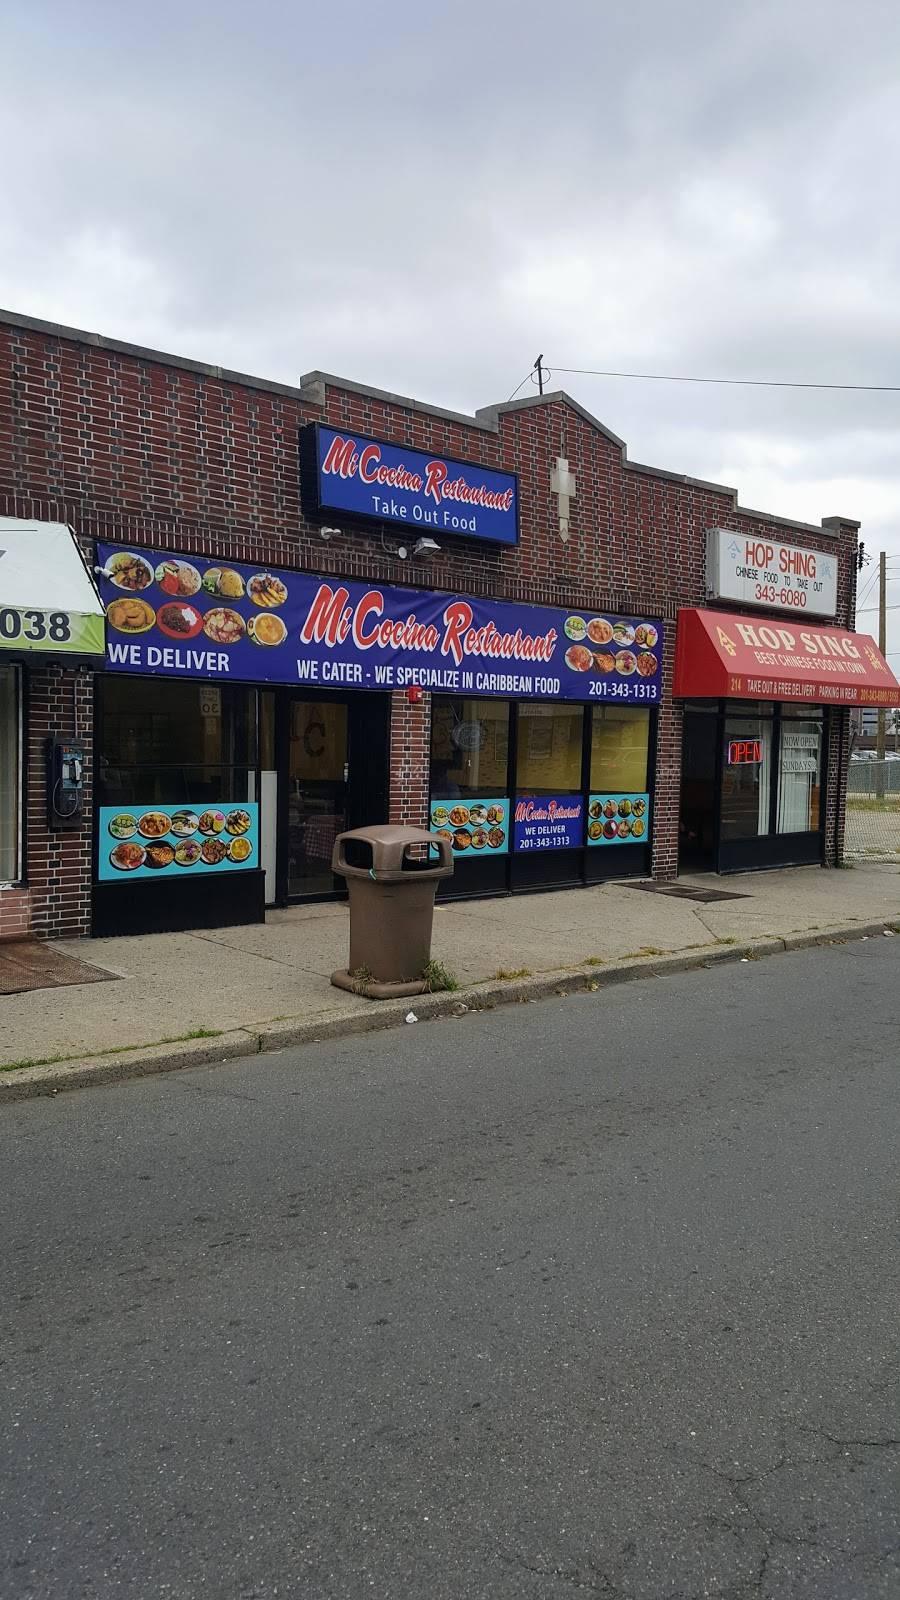 Hop Sing Restaurant   restaurant   214 Essex St, Hackensack, NJ 07601, USA   2013436080 OR +1 201-343-6080